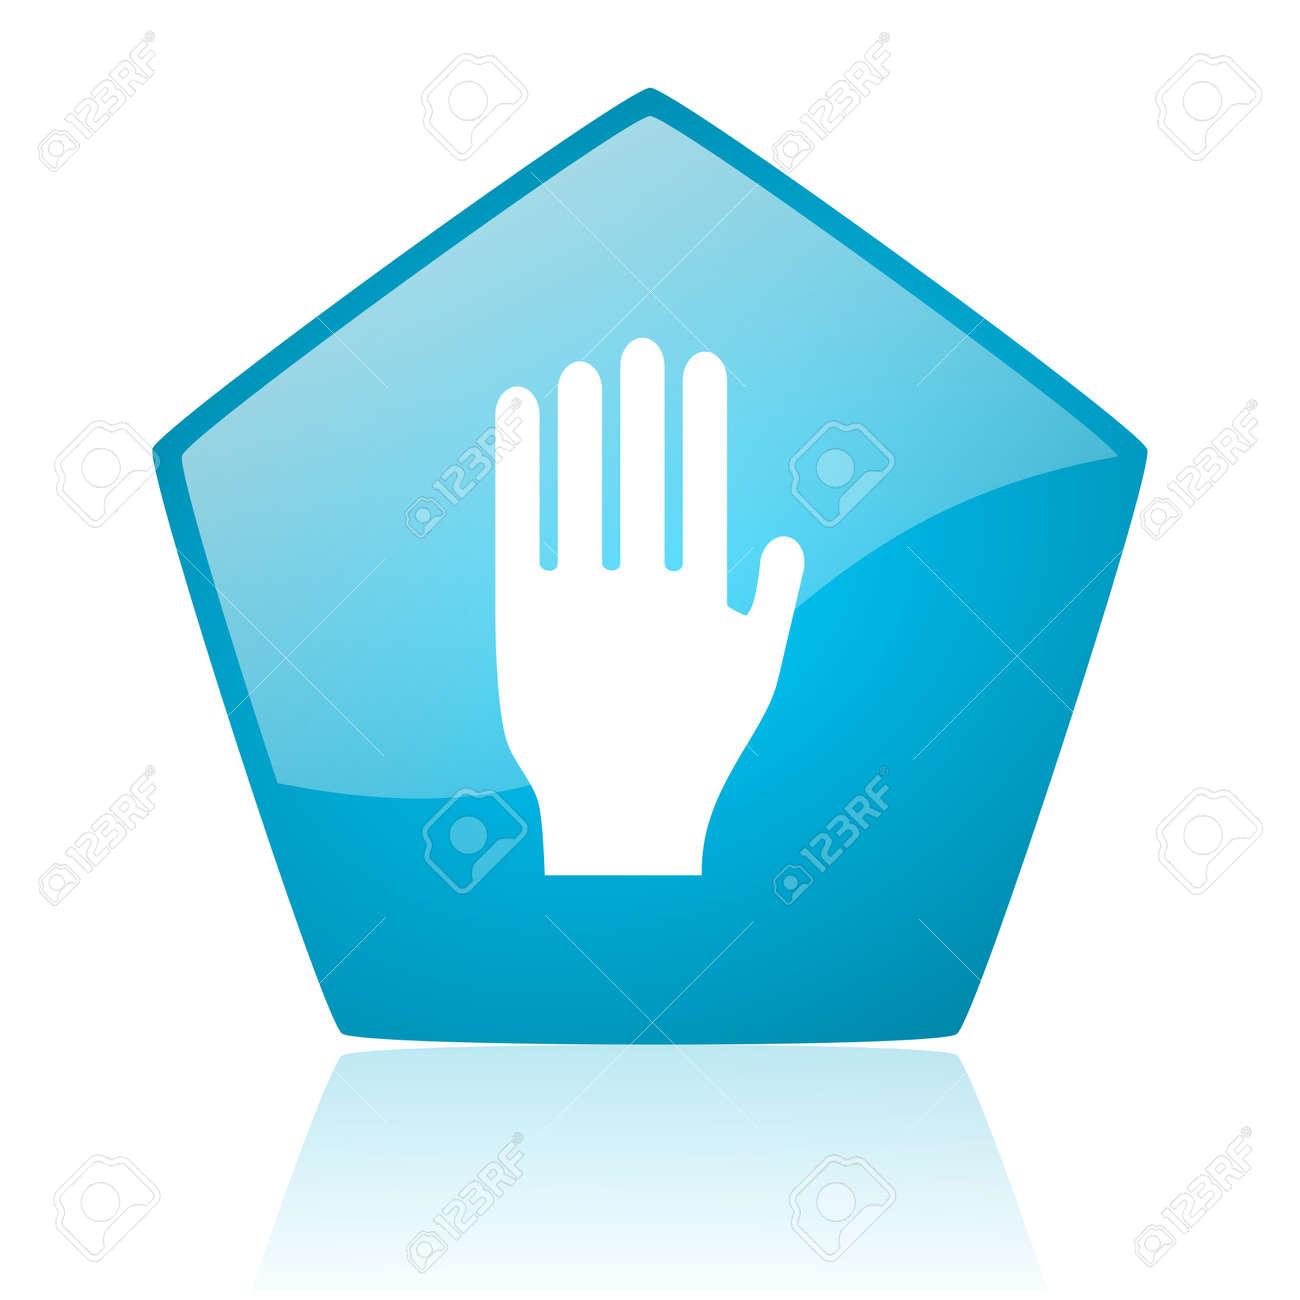 stop blue pentagon web glossy icon Stock Photo - 19171761